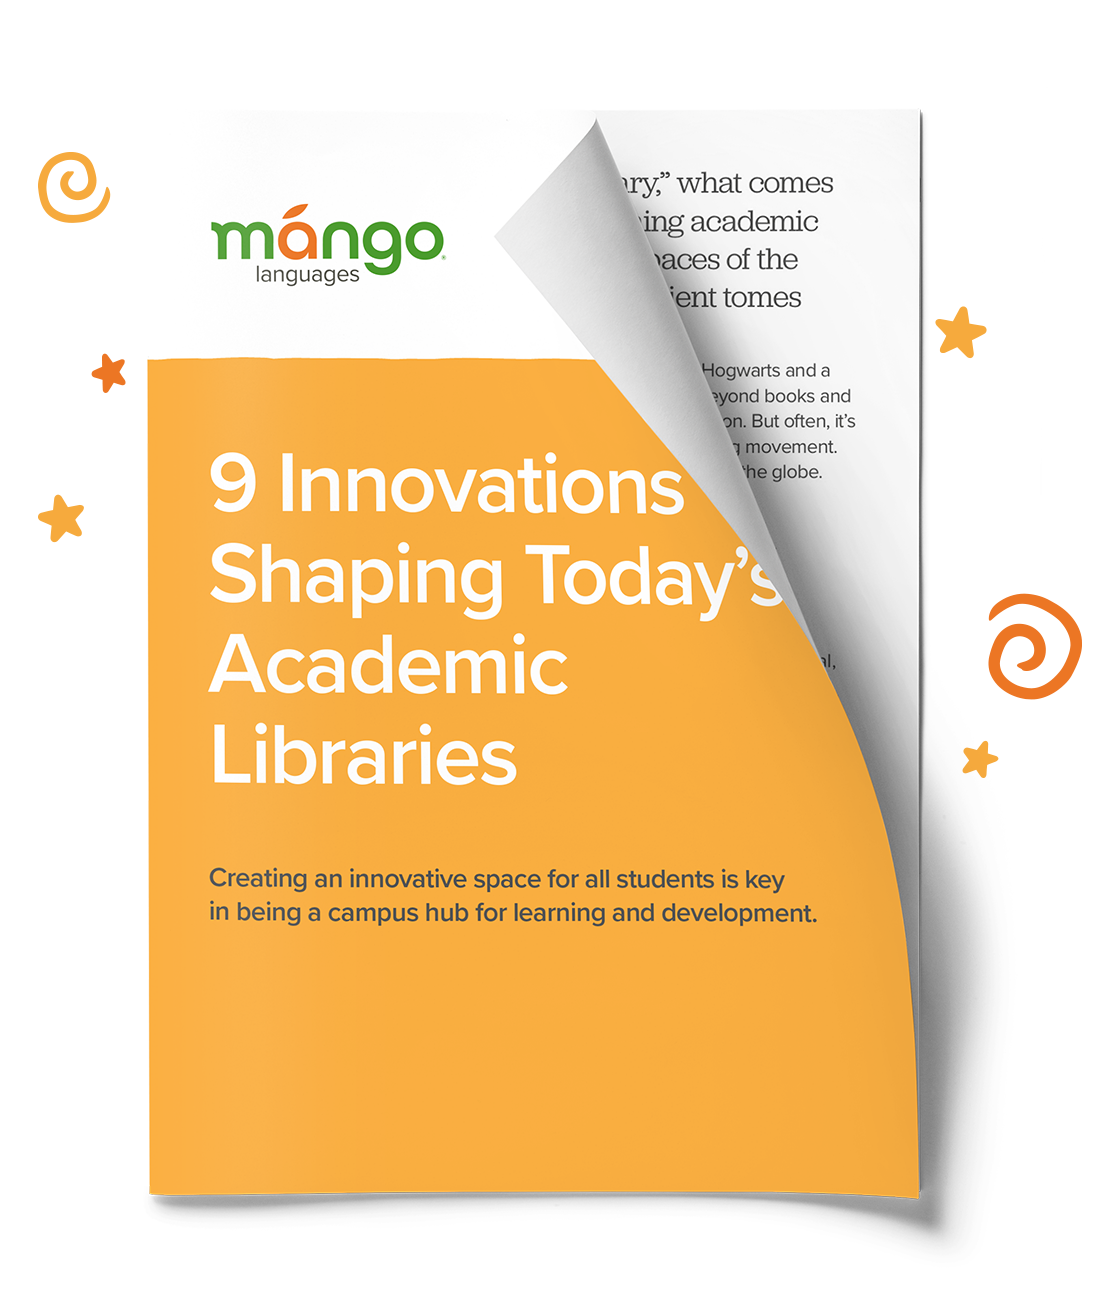 mango-inbound-9-innovations.png